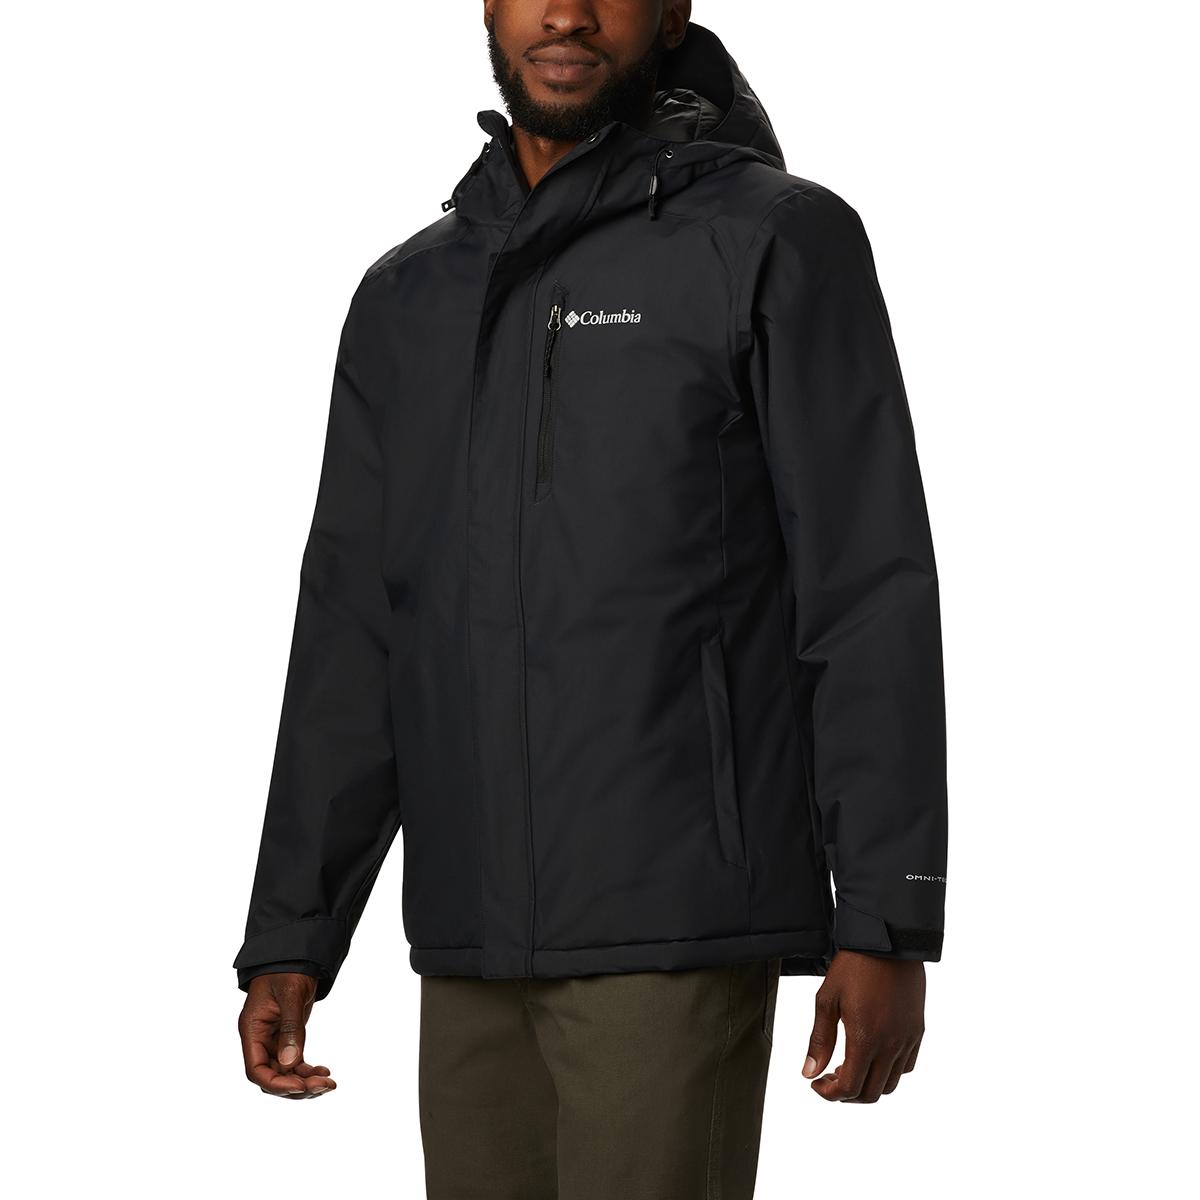 Columbia Men's Tipton Peak Insulated Jacket - Black, S